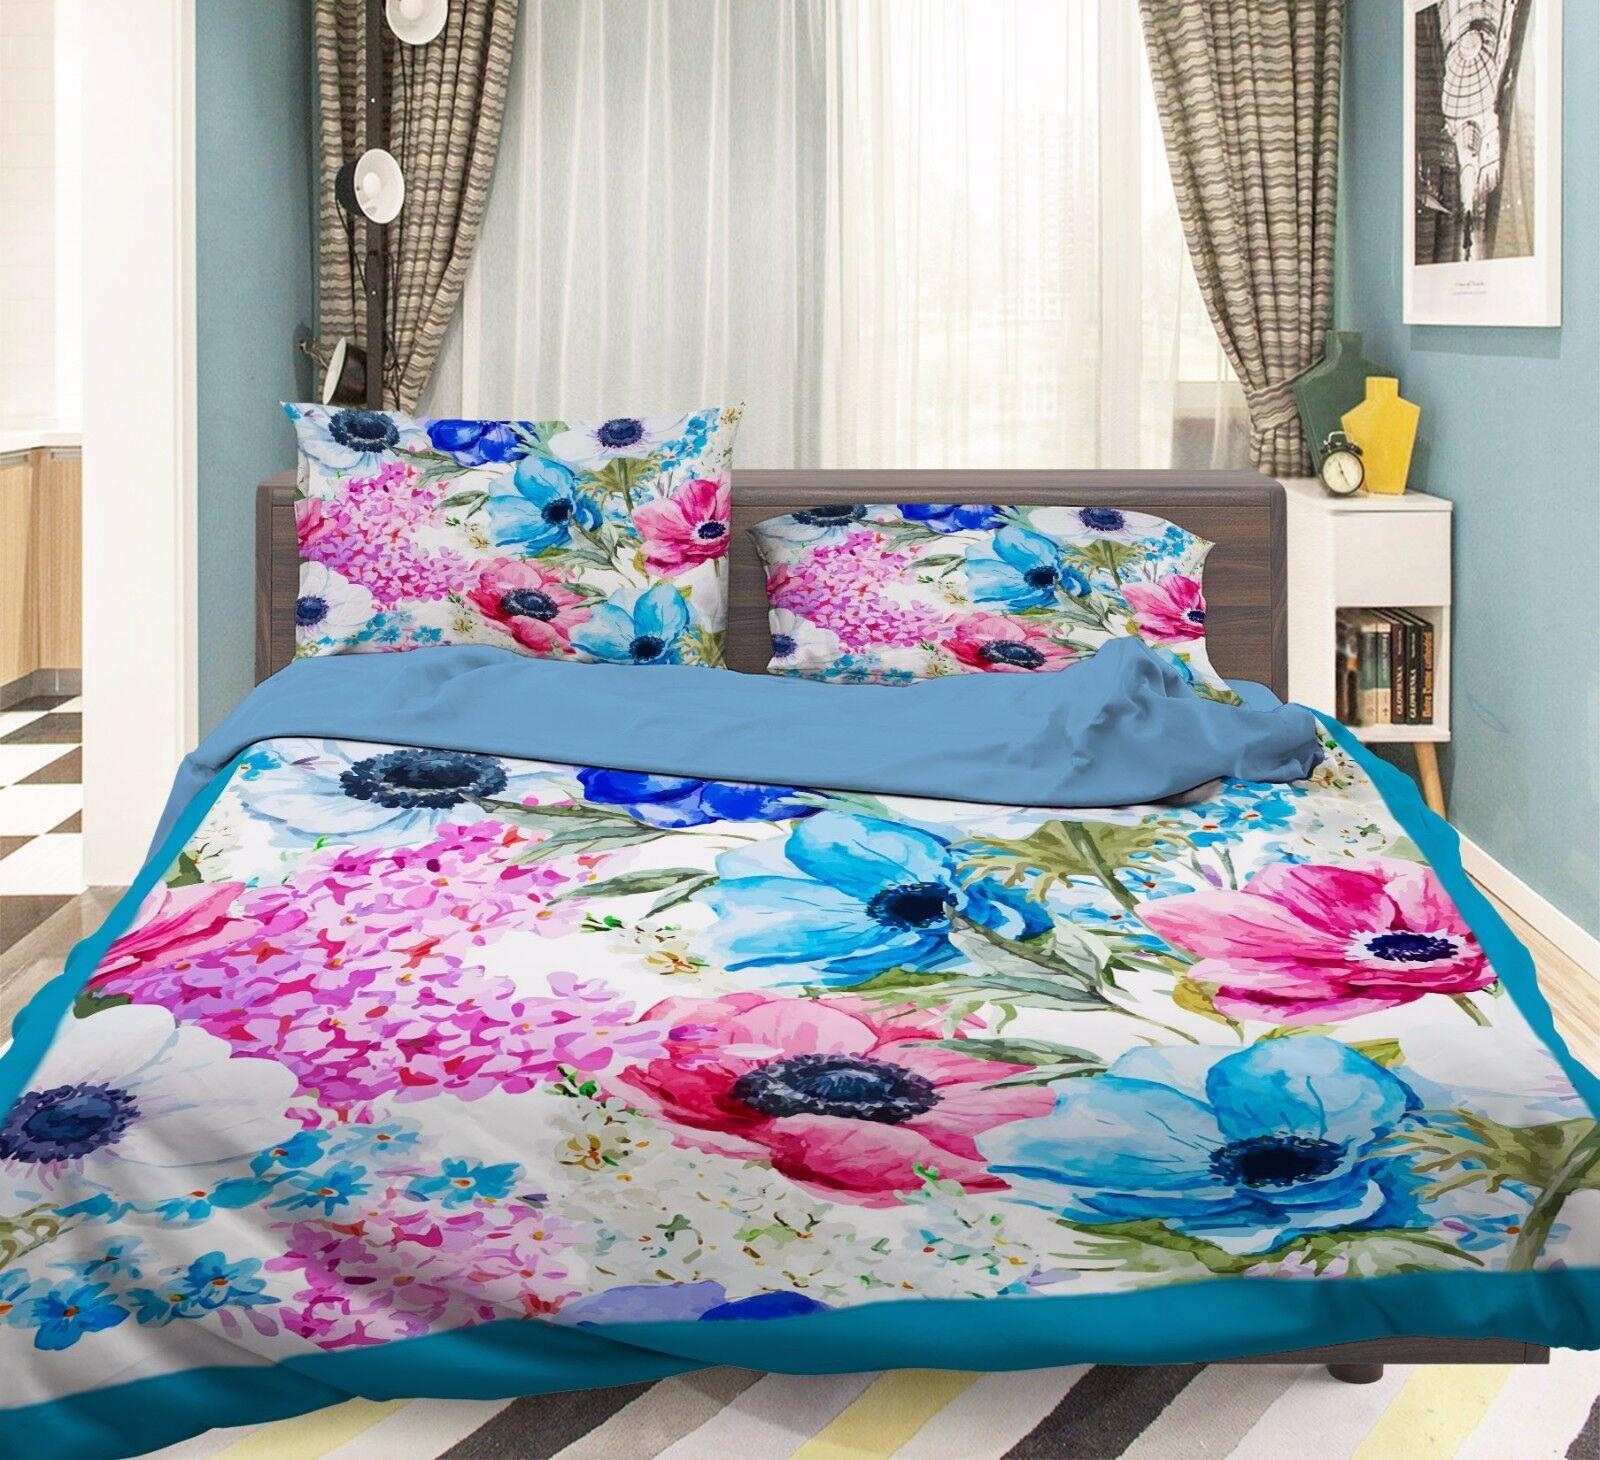 3D Paint Petals 755 Bed Pillowcases Quilt Duvet Cover Set Single Queen UK Summer